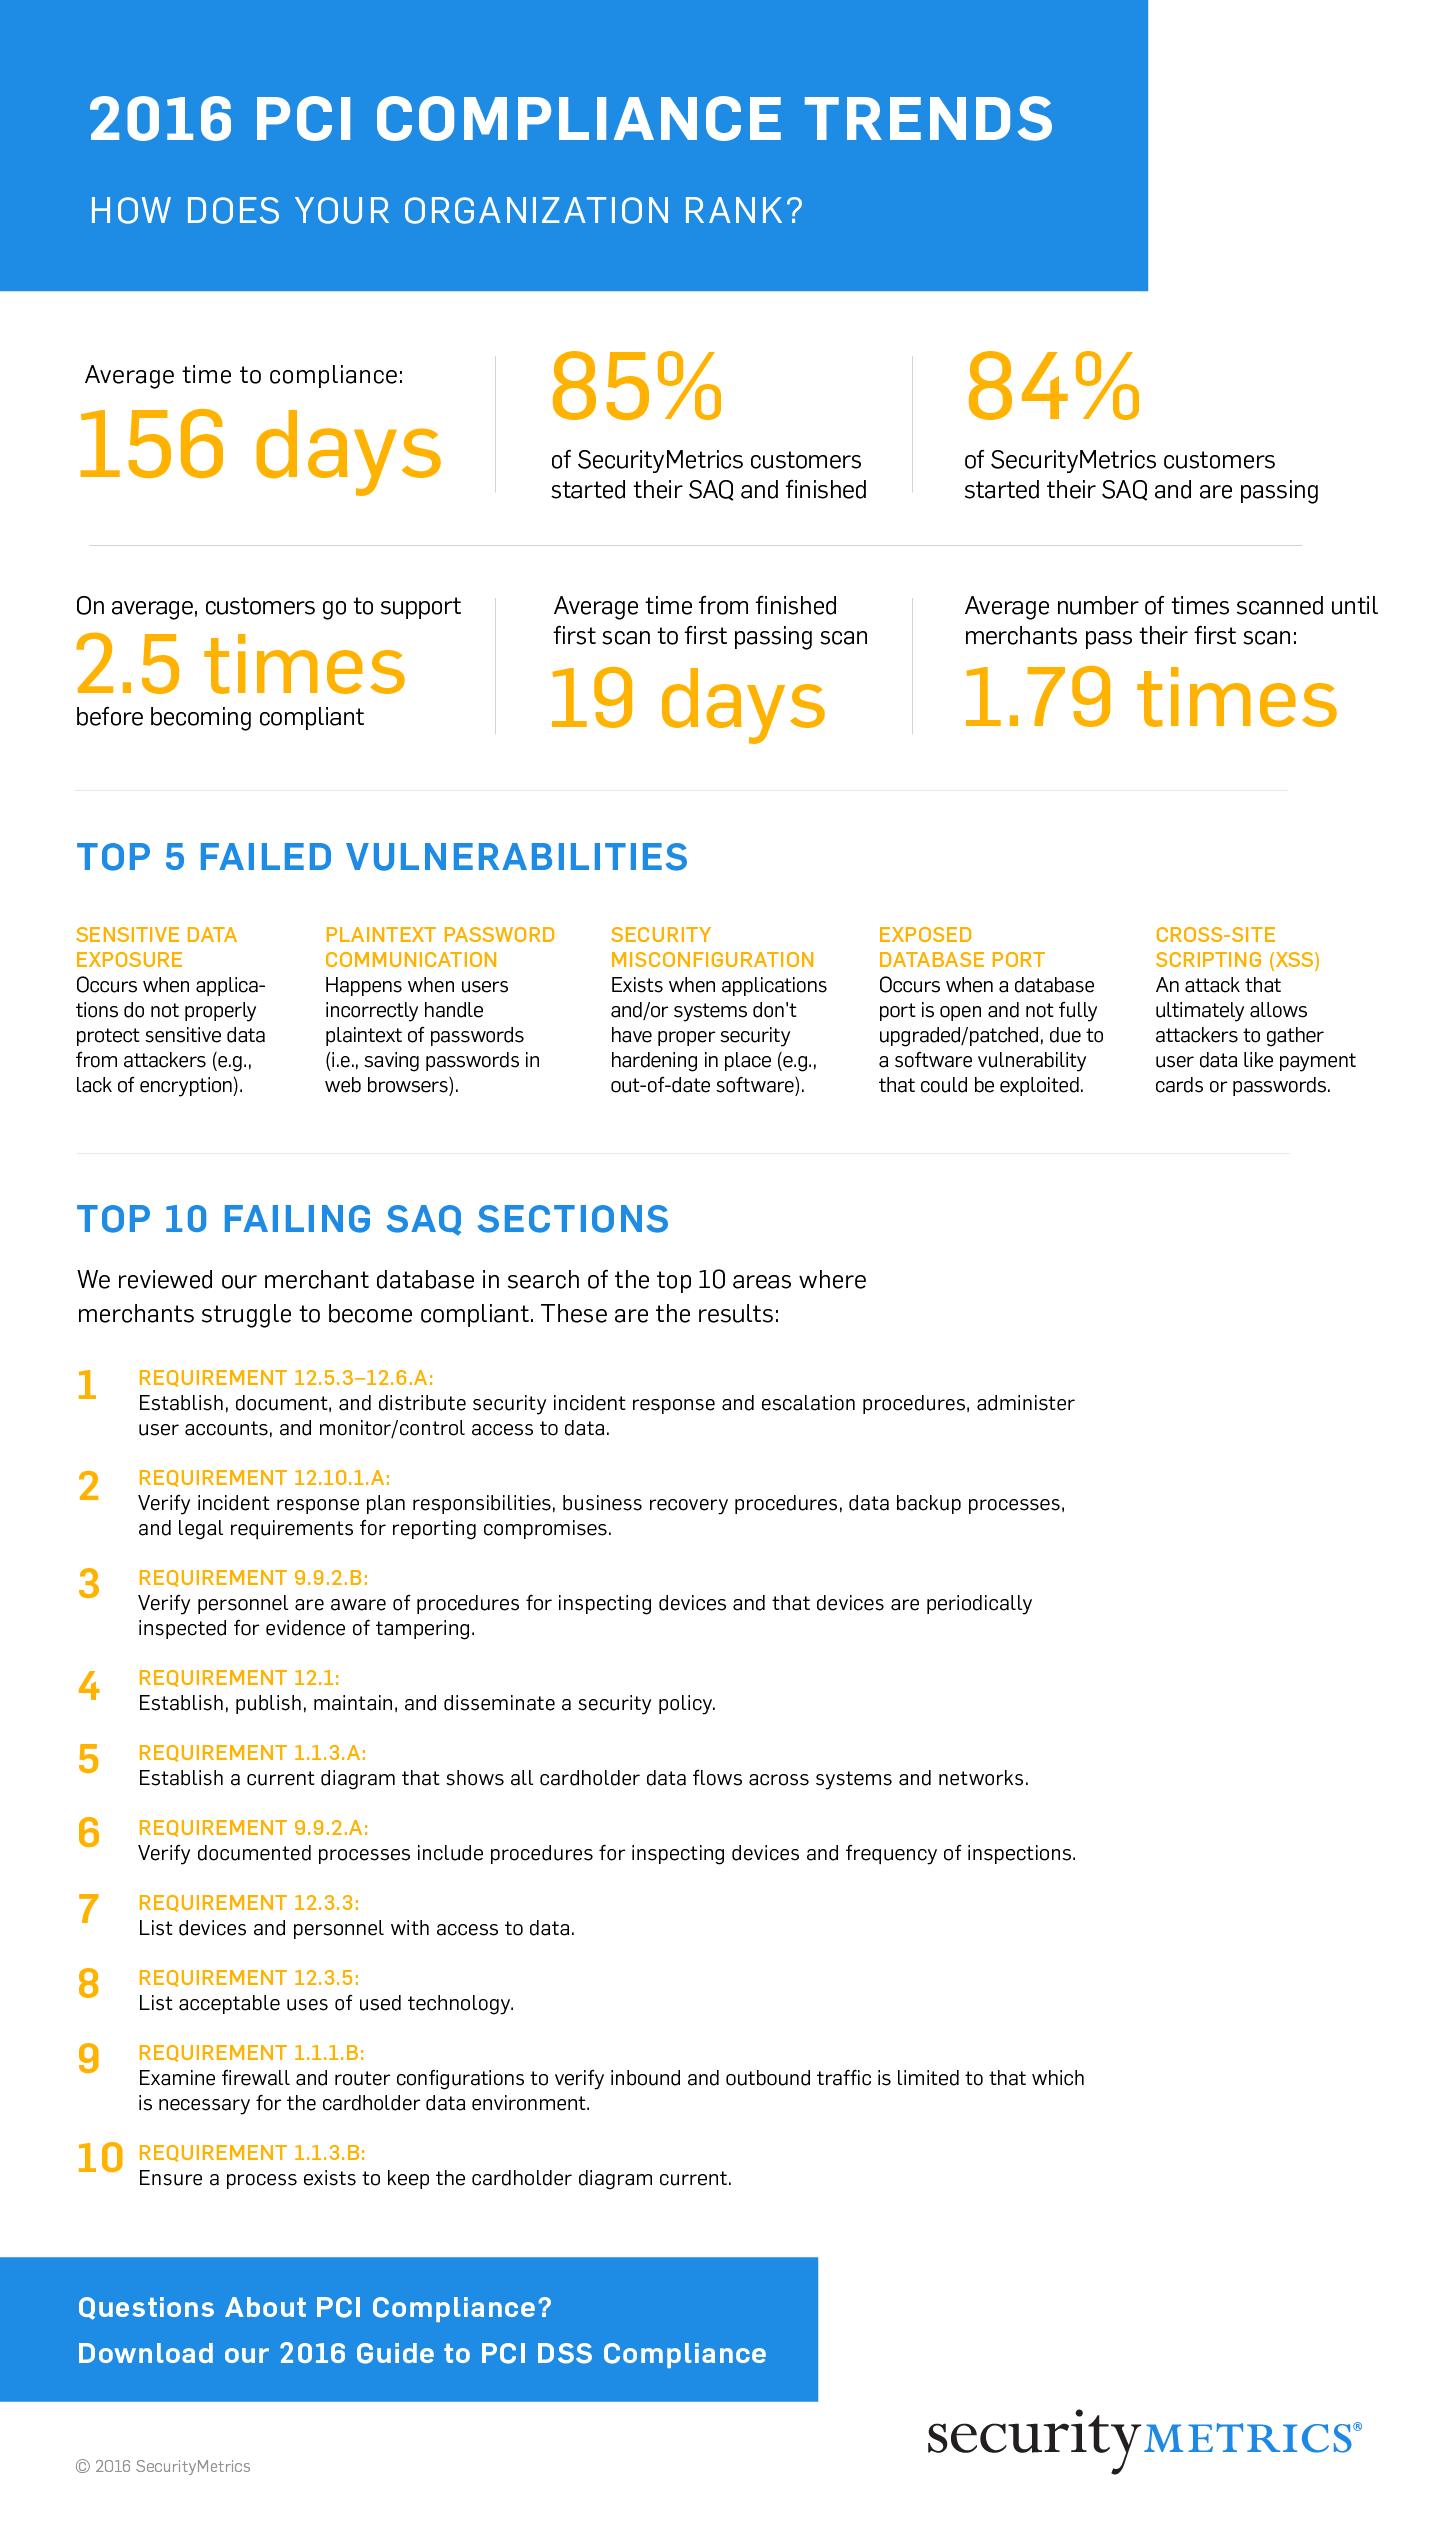 2016 PCI Compliance Trends